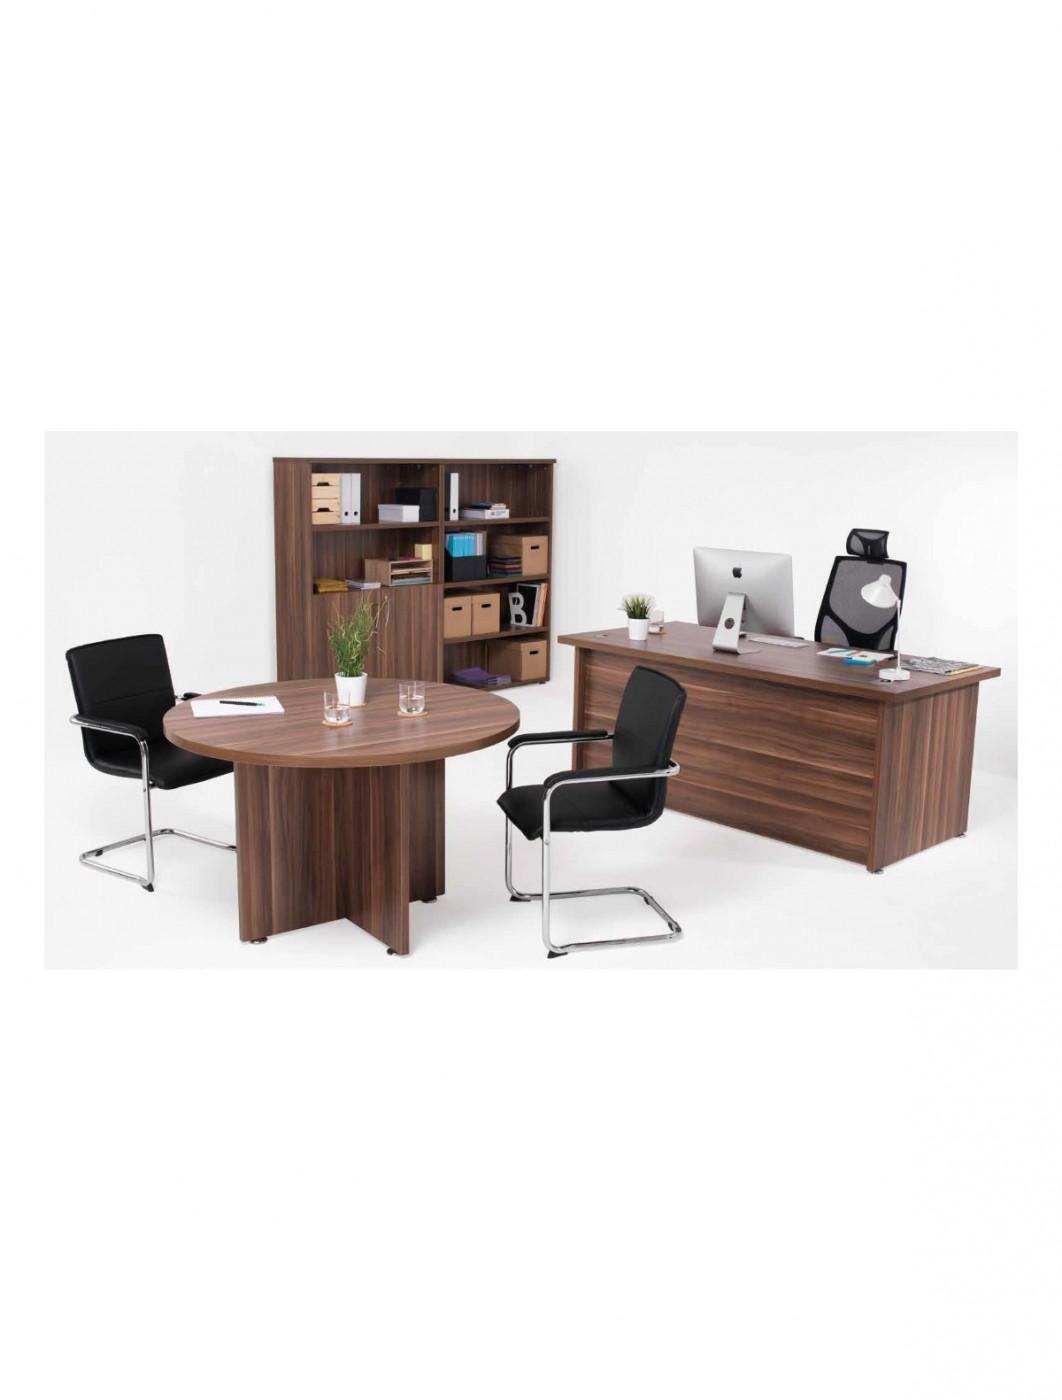 Dark walnut office desks tc regent executive round meeting table tr1200mtdw enlarged view